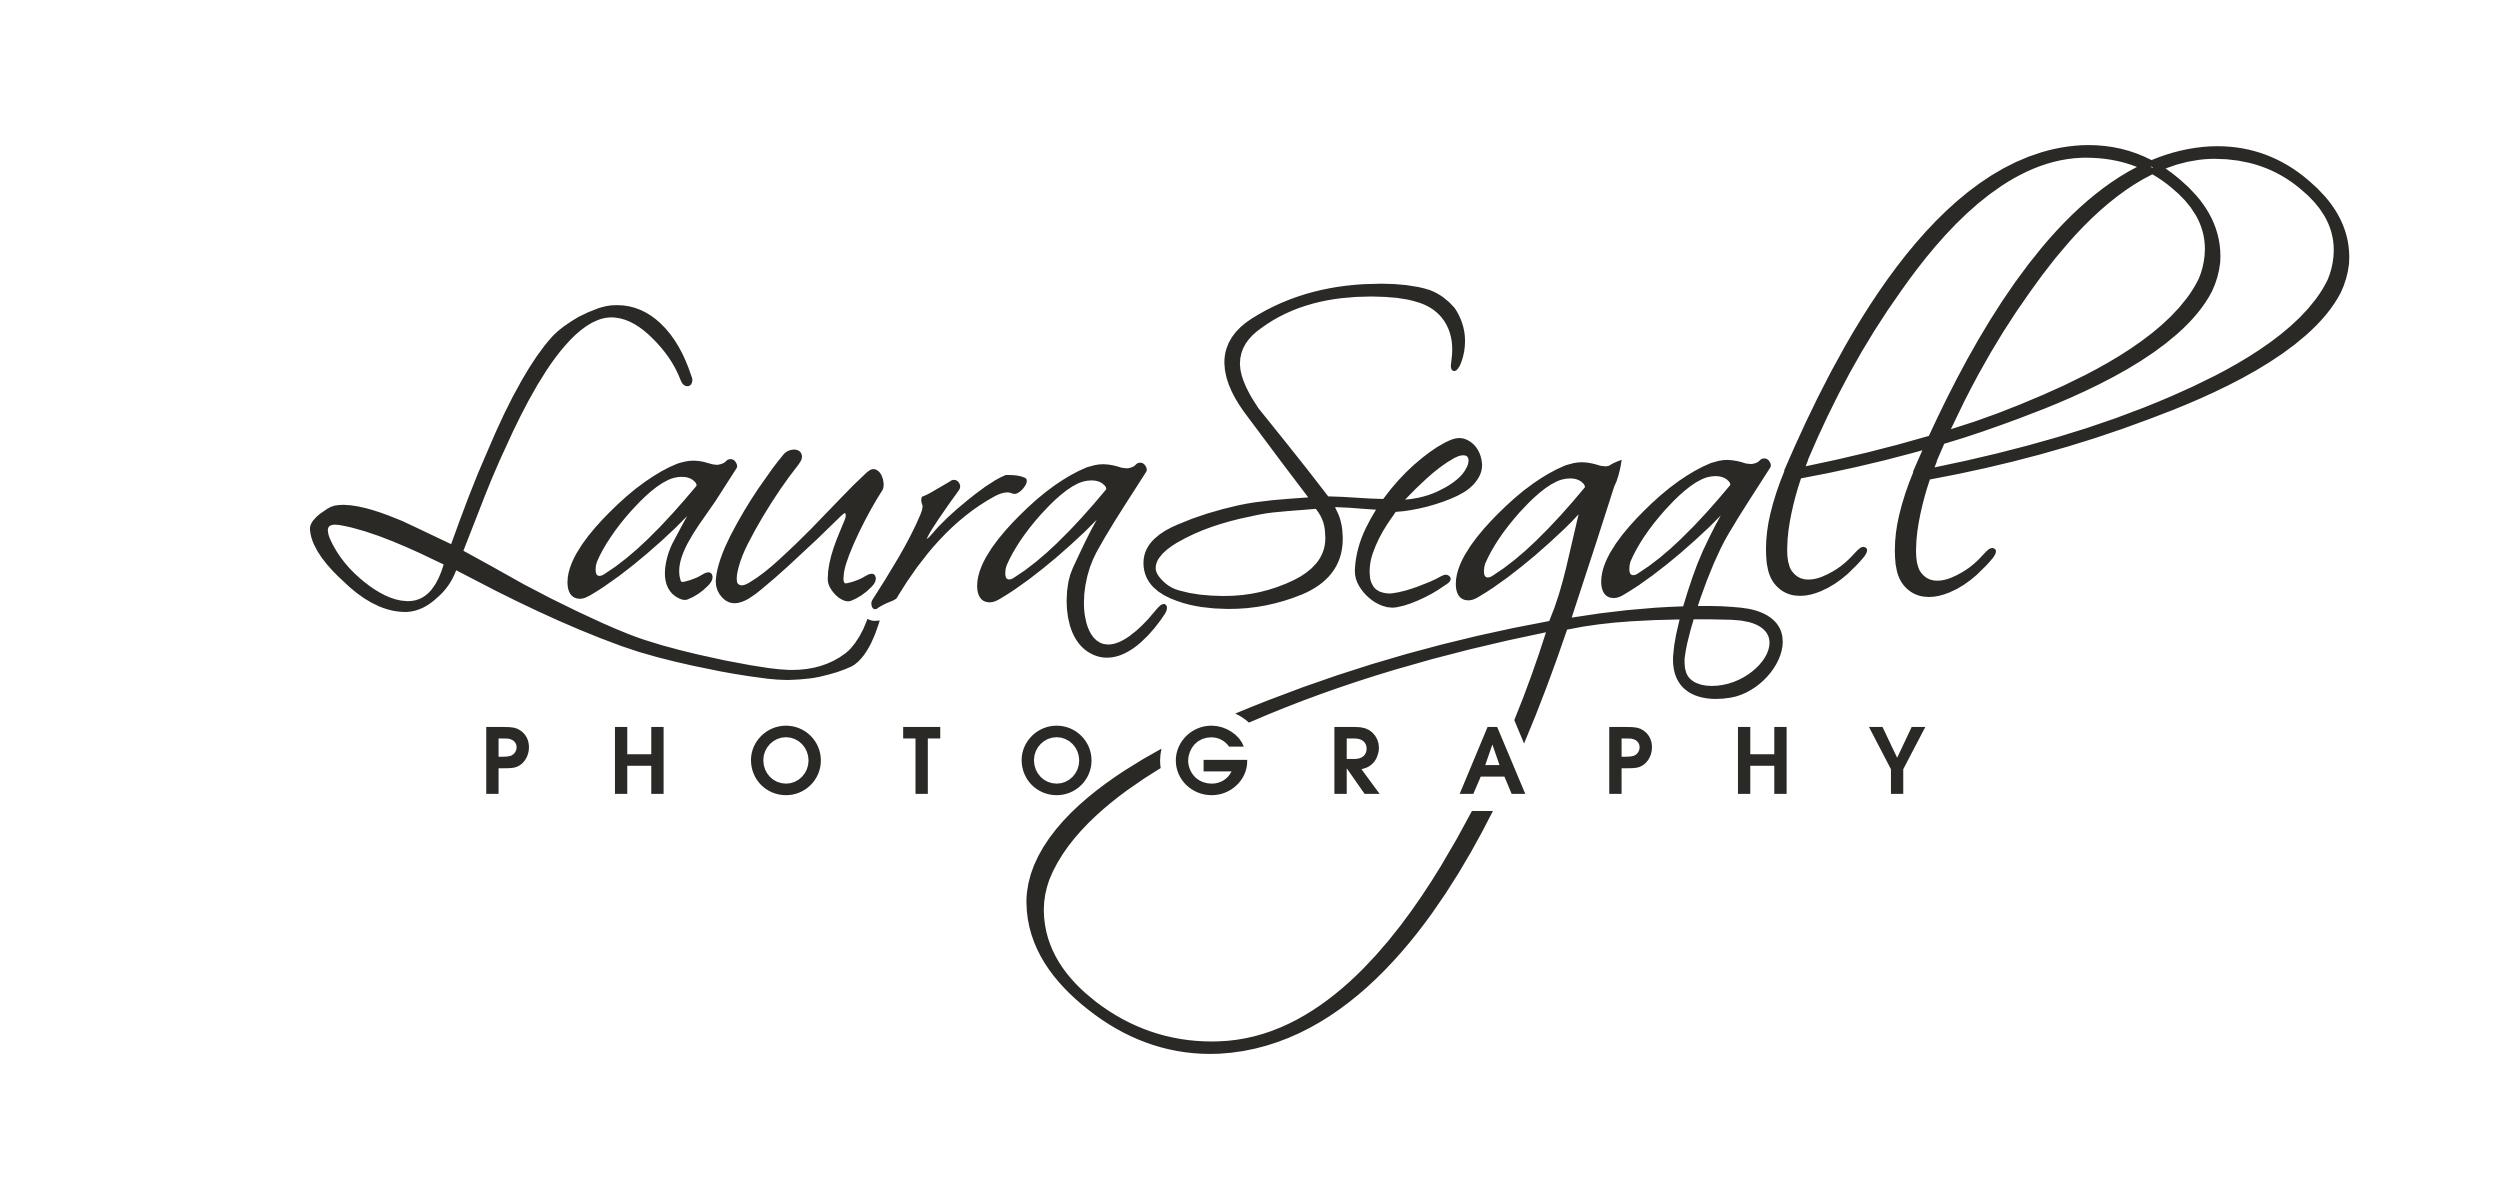 Laura Segall Photography- Blog